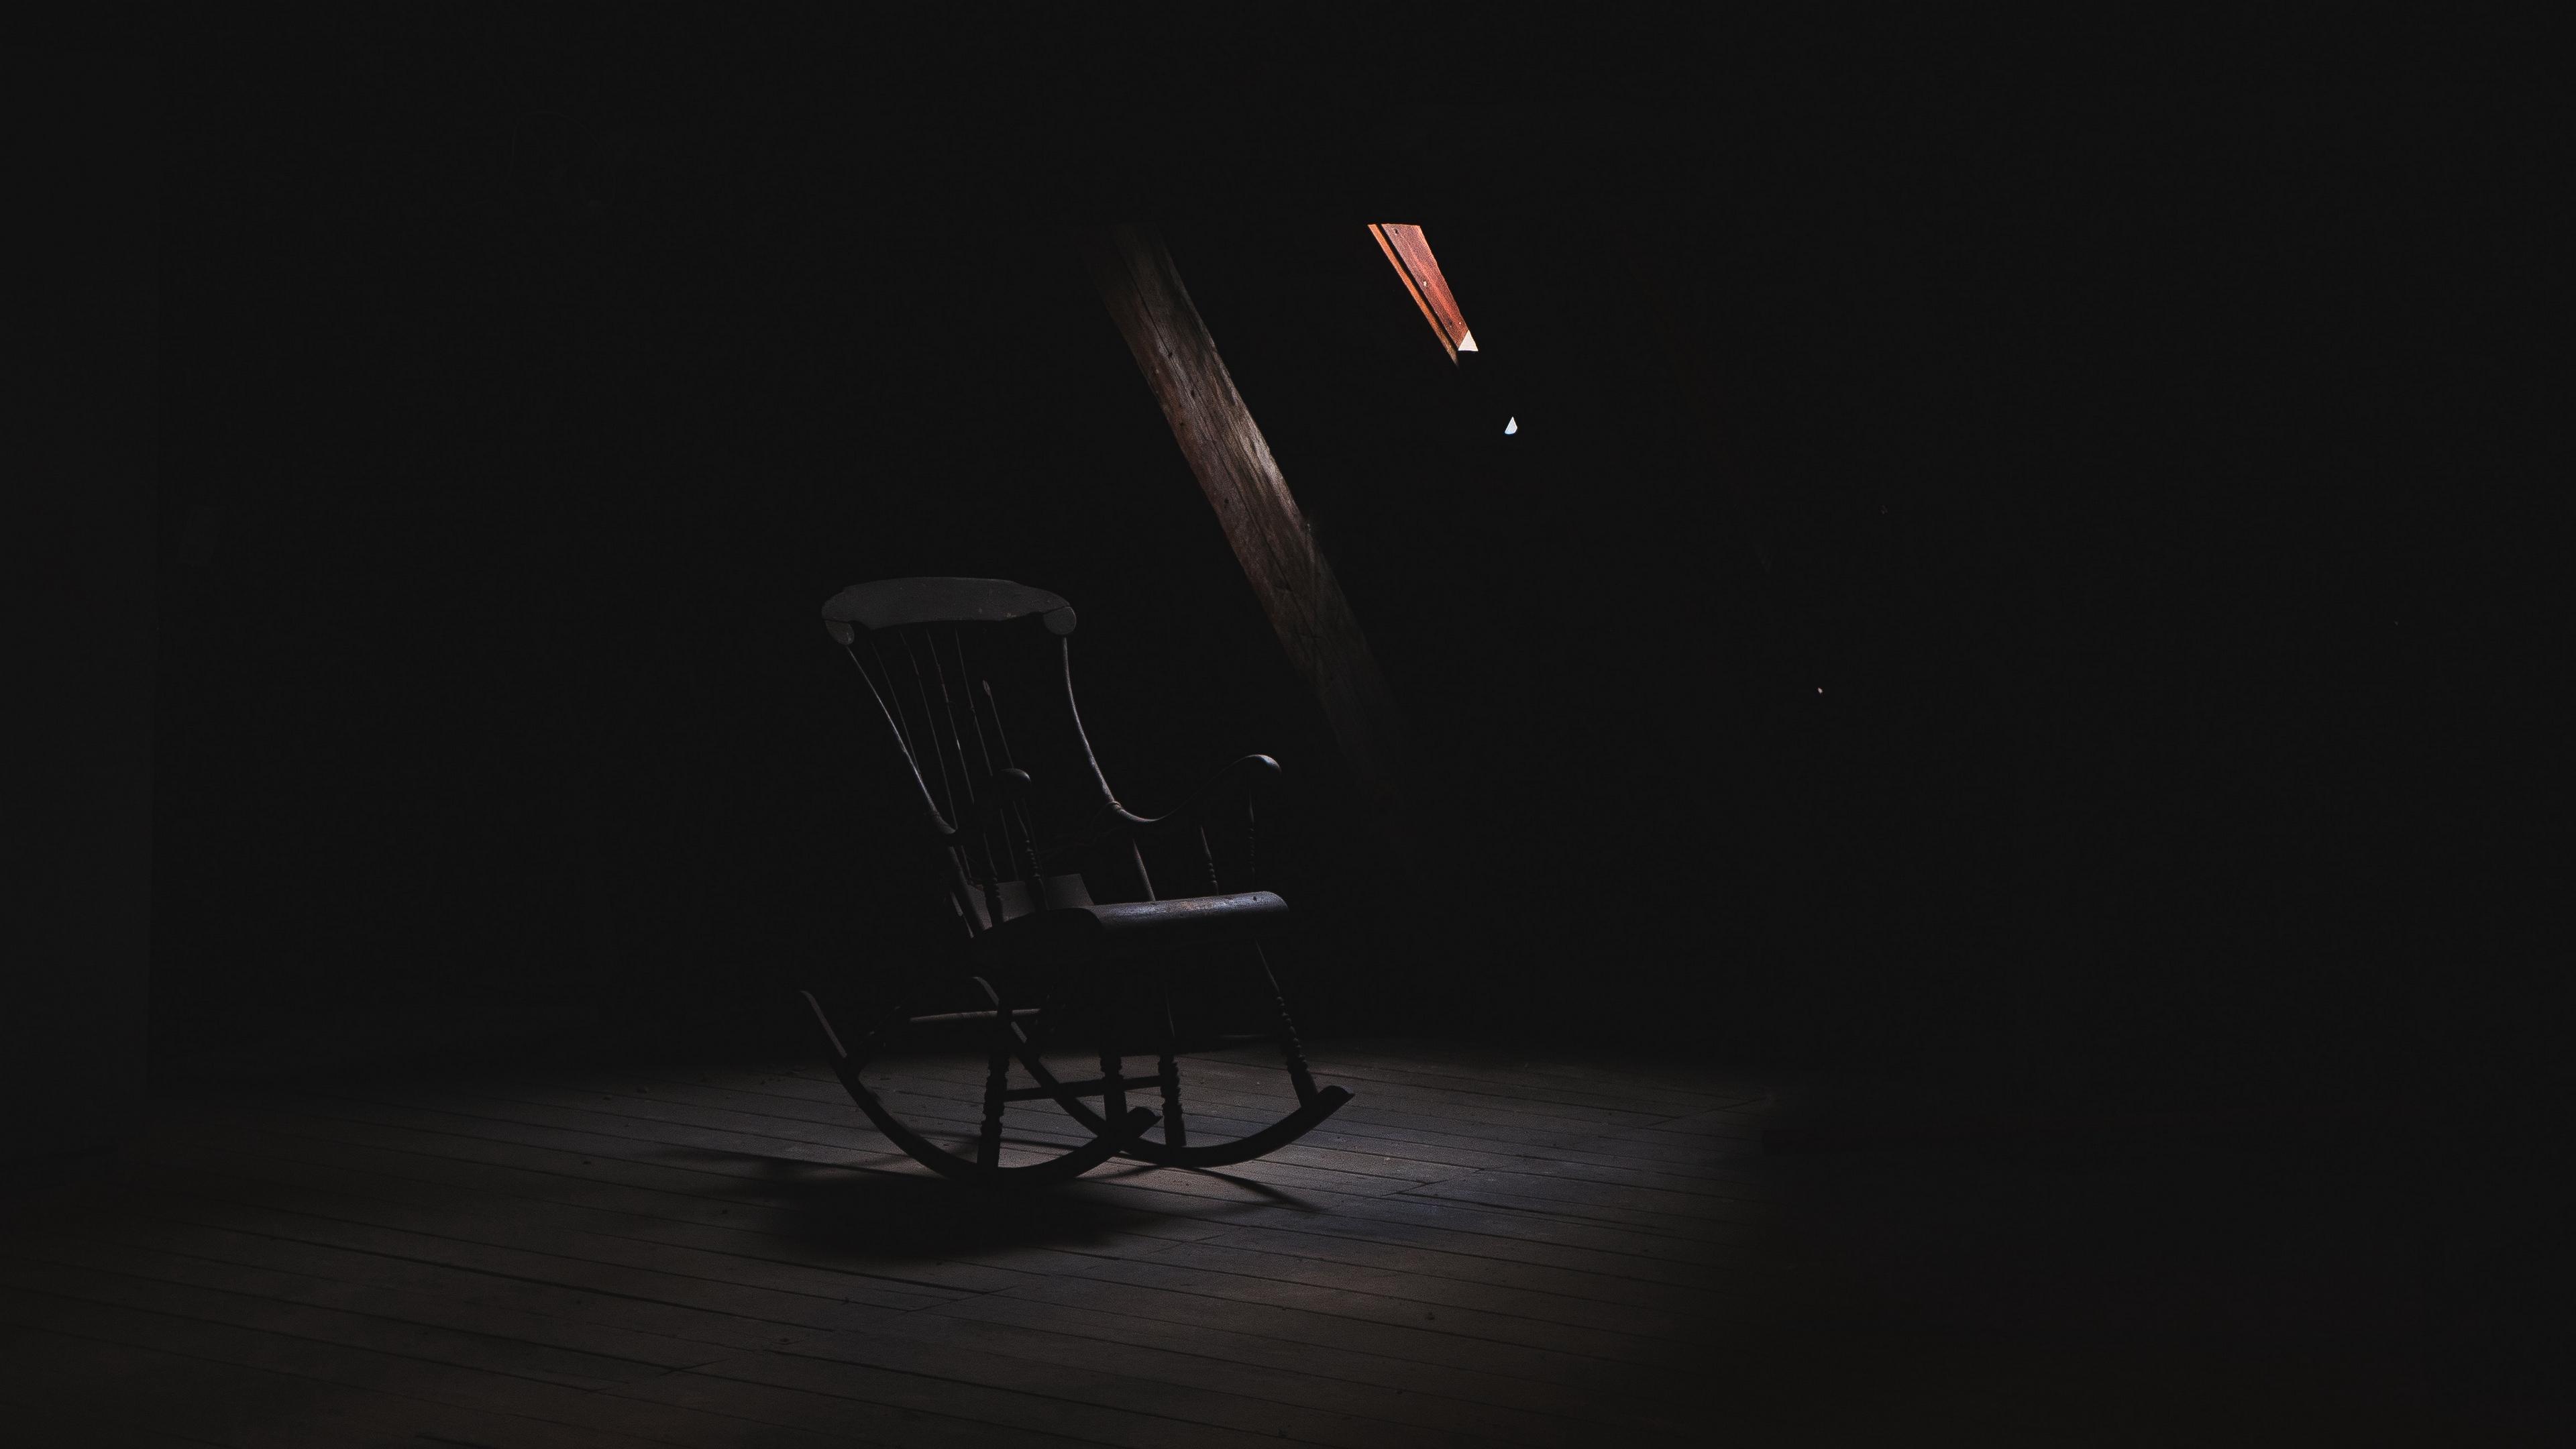 rocking chair loft dark creepy 4k 1540575930 - rocking chair, loft, dark, creepy 4k - rocking chair, loft, Dark